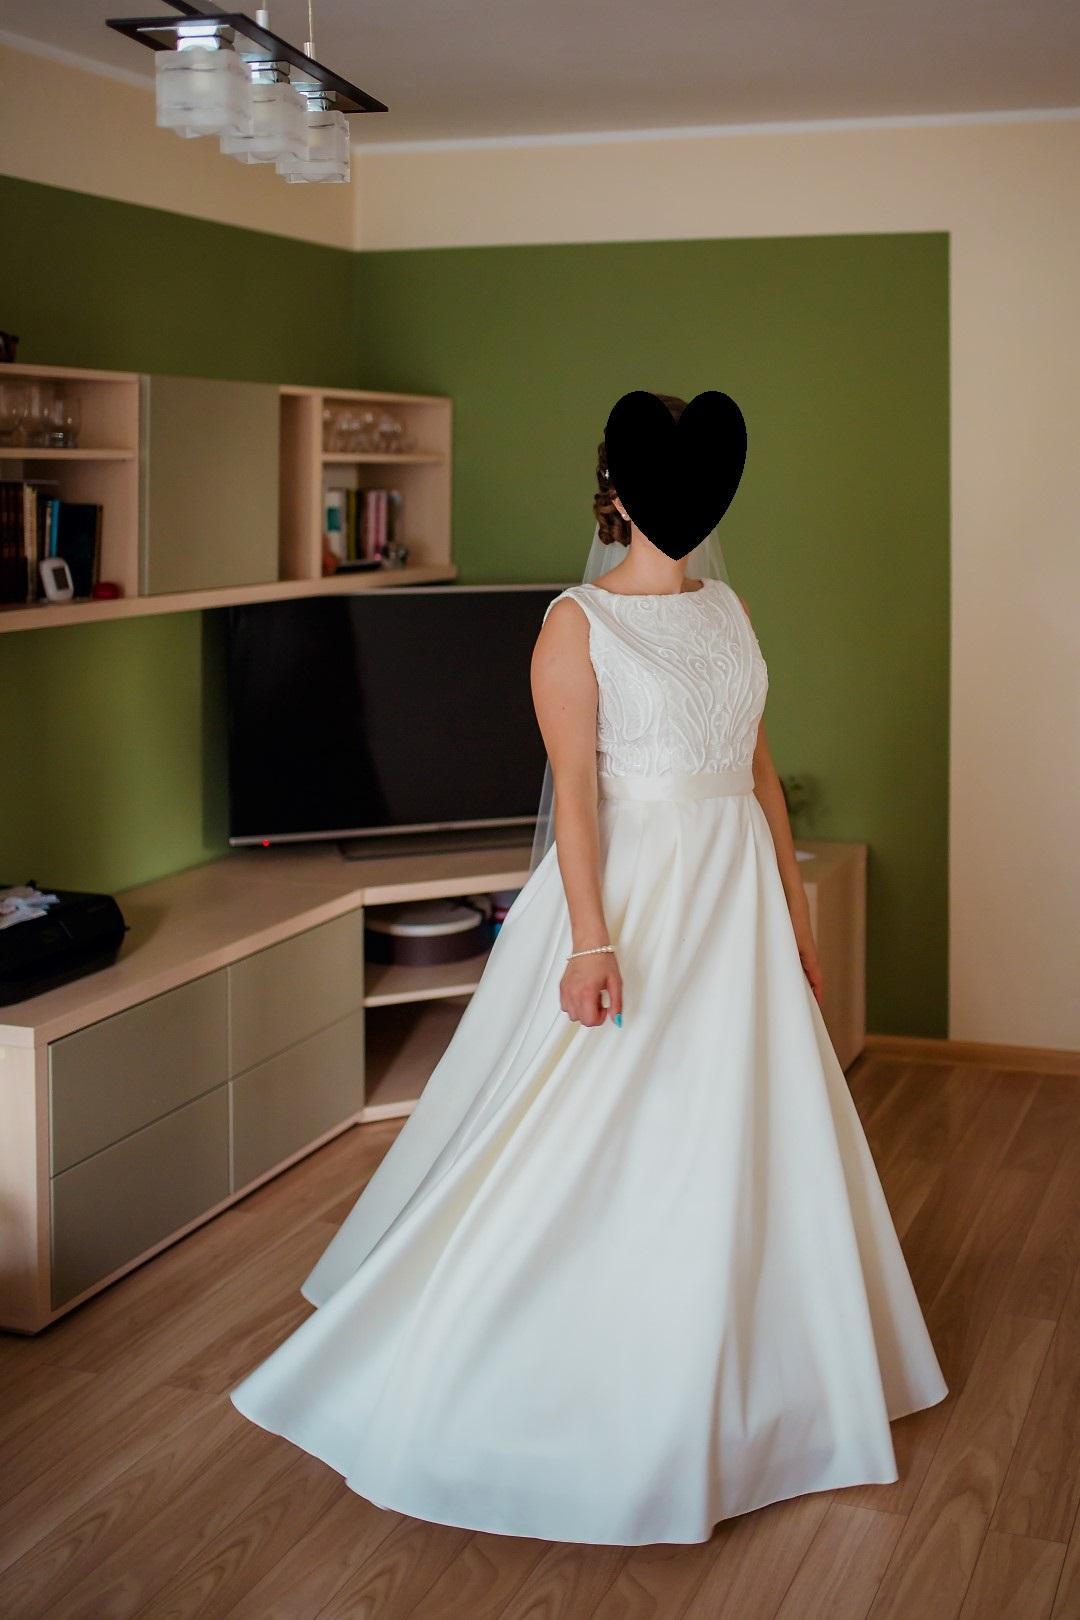 Piękna Suknia ślubna Z Koronką I Tyłem W Literę V Kielce